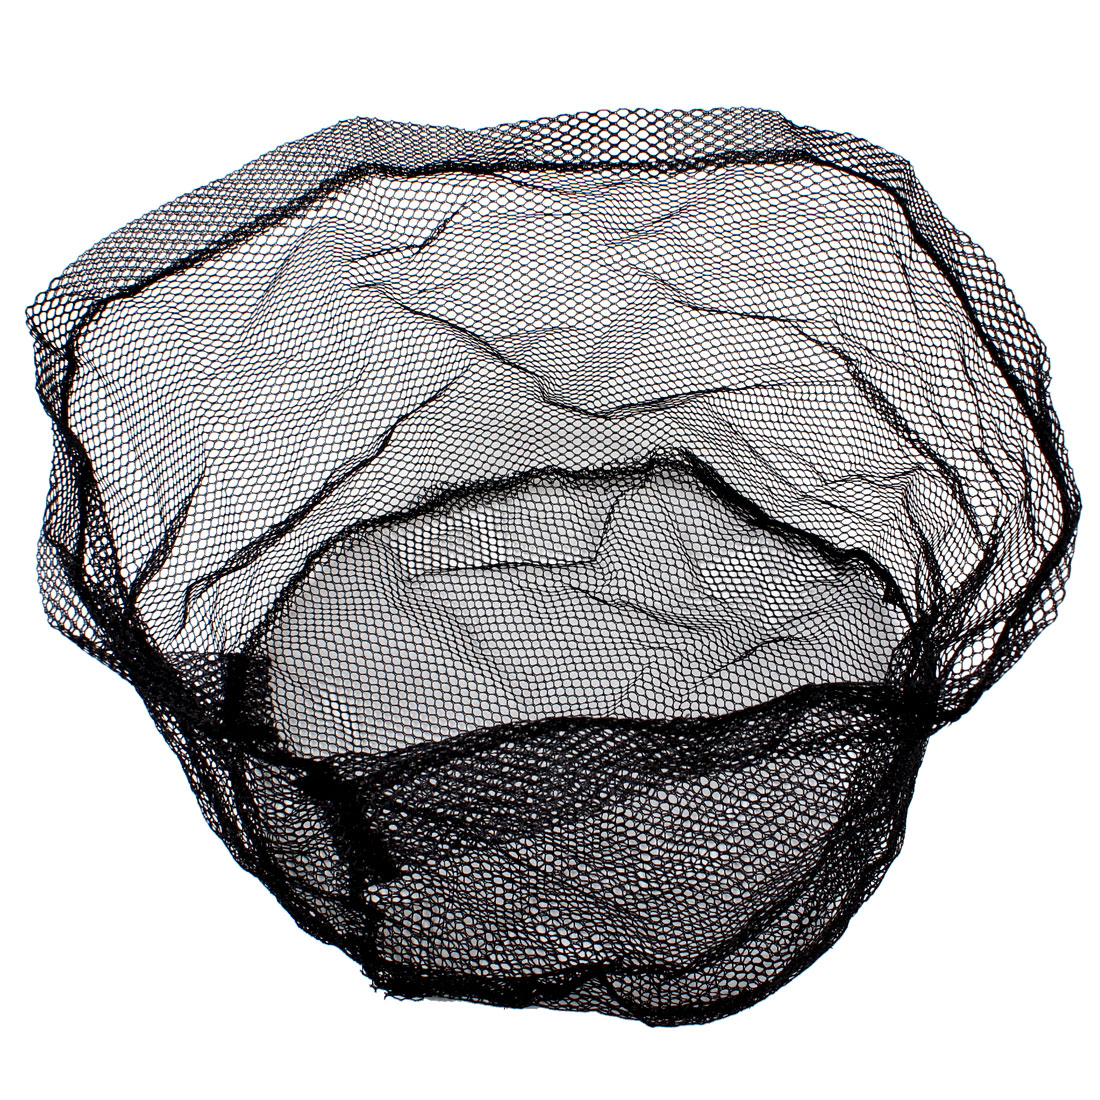 "Black 11.4"" Depth Fishing Landing Net Head 6mm x 3.5mm Mesh"